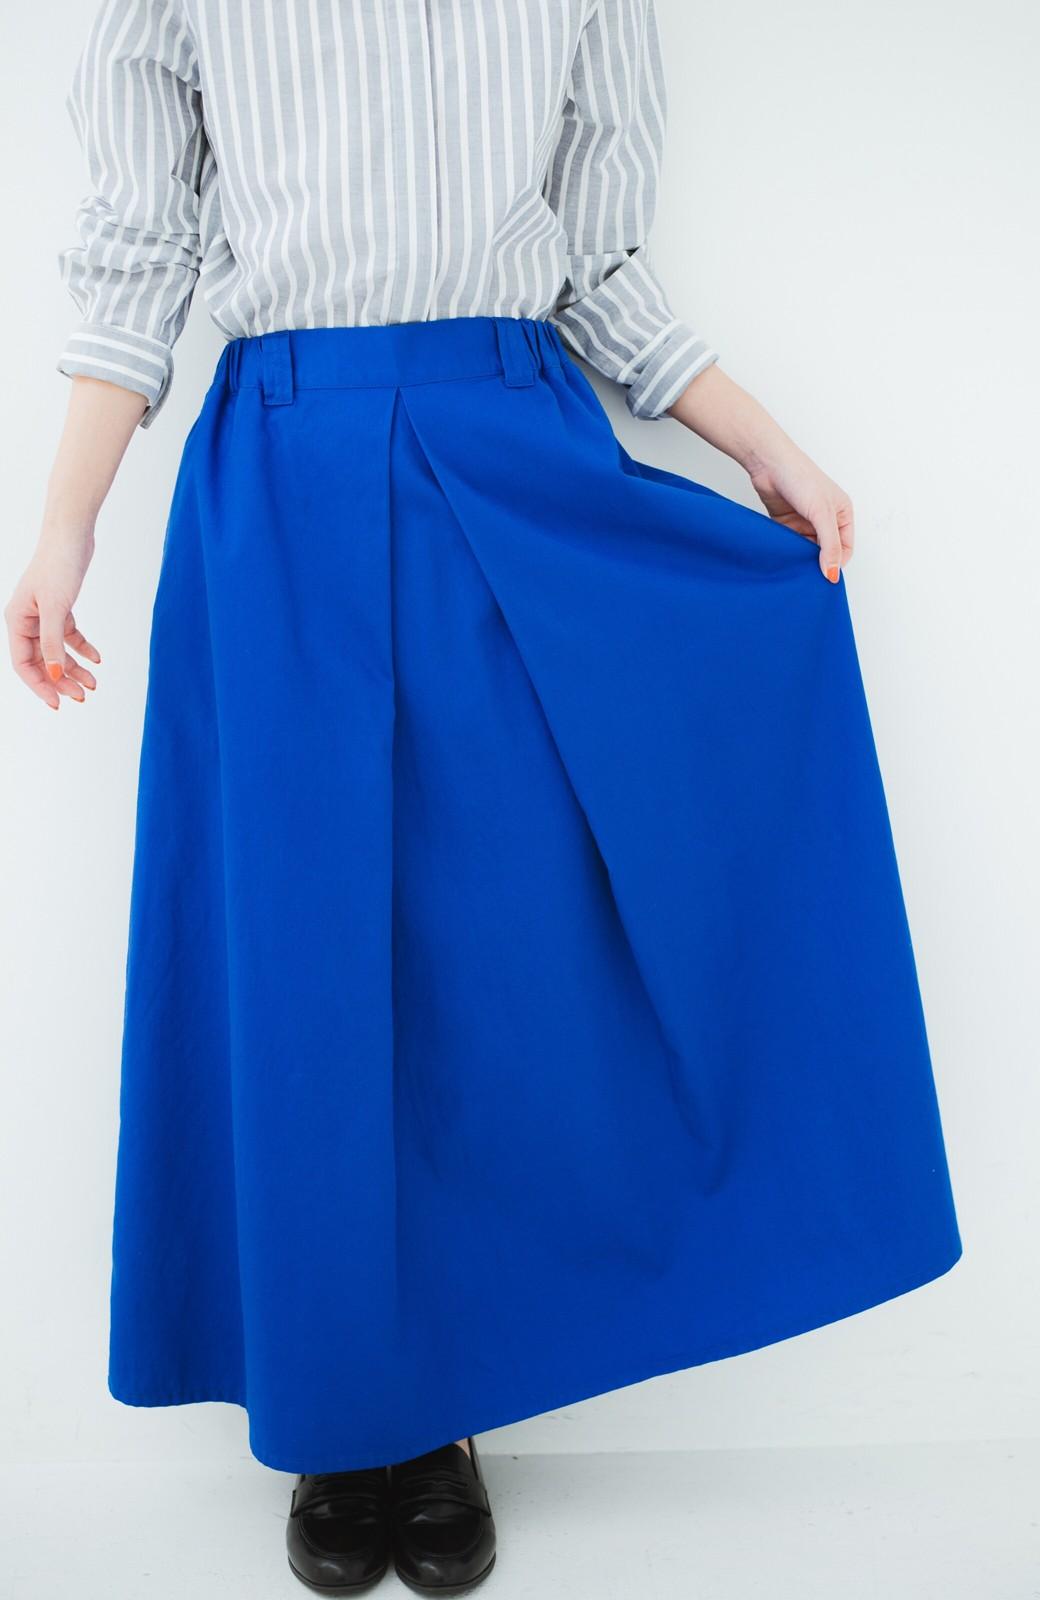 haco! 【今年も再販!】ロングシーズン楽しめる タックボリュームのチノロングスカート <ブルー>の商品写真1